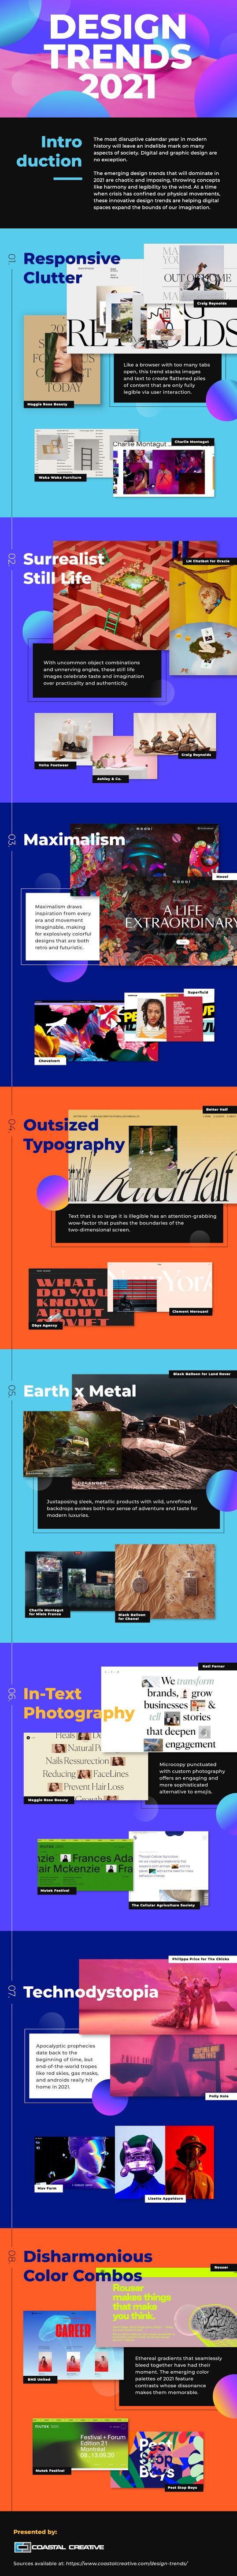 8 Disruptive Digital & Graphic Design Trends of 2021 #infographic #Digital Marketing #Marketing